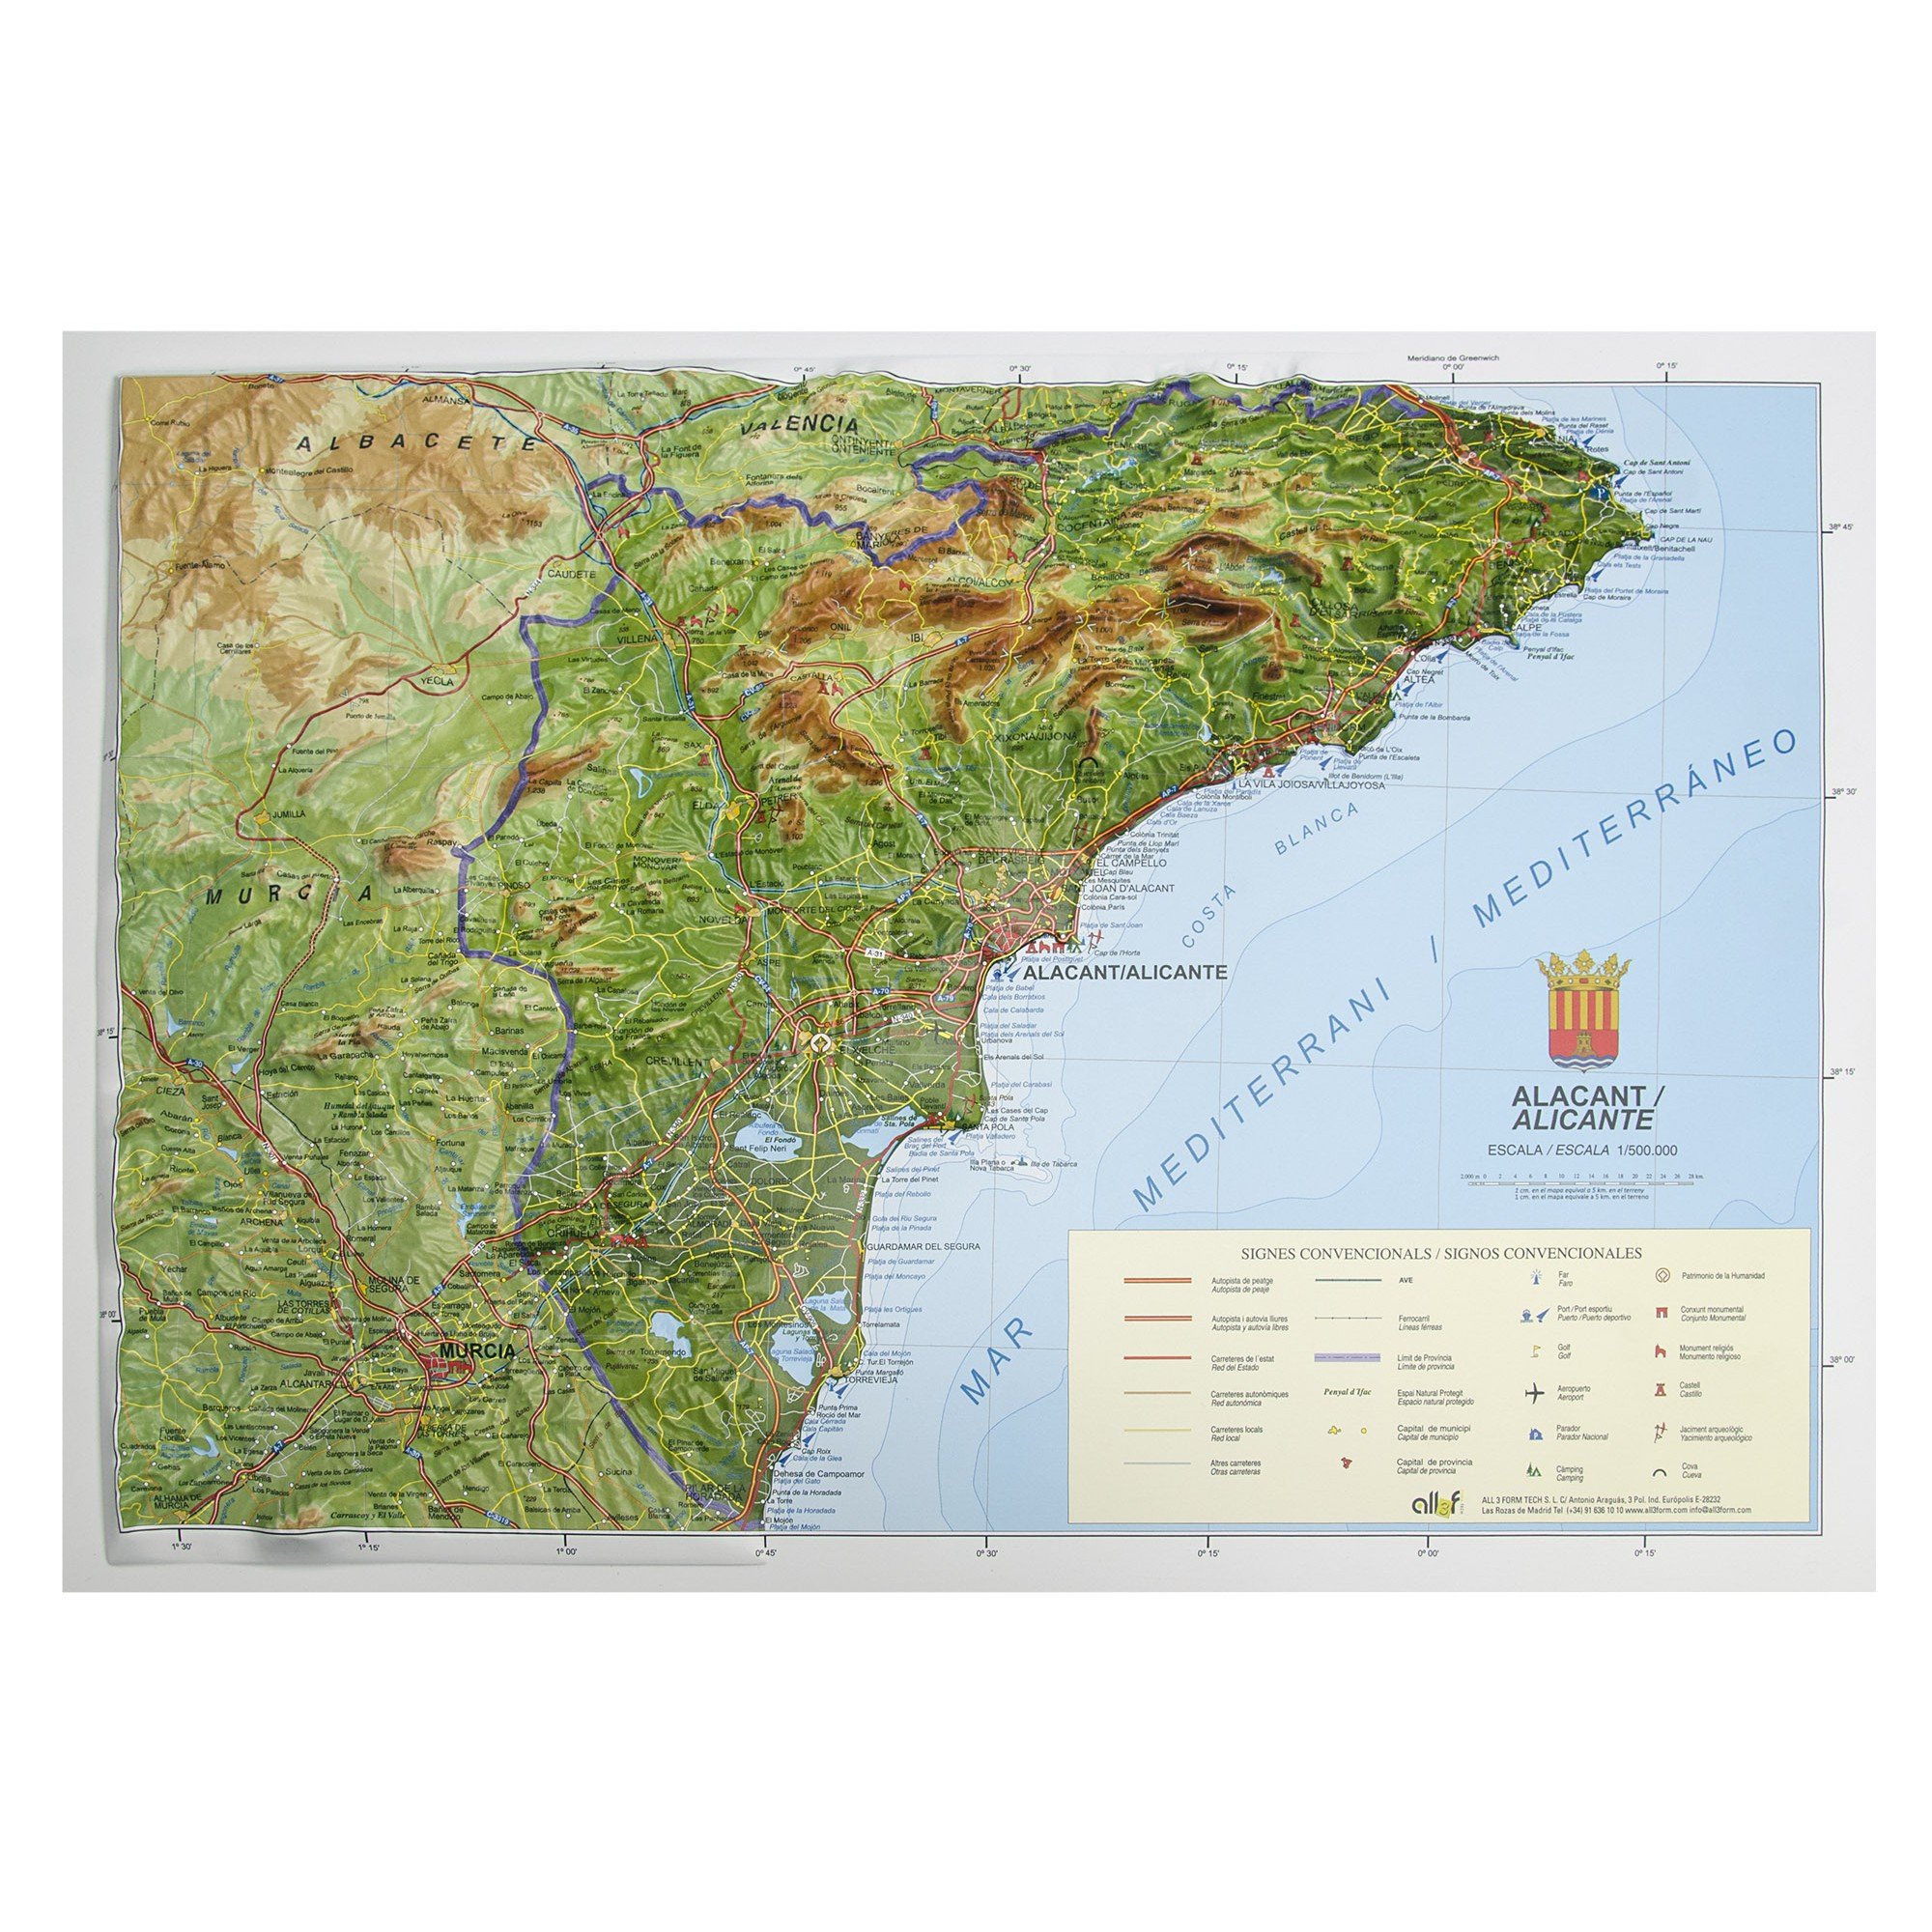 Mapa Carreteras Provincia Alicante.Provincia De Alicante Alacant